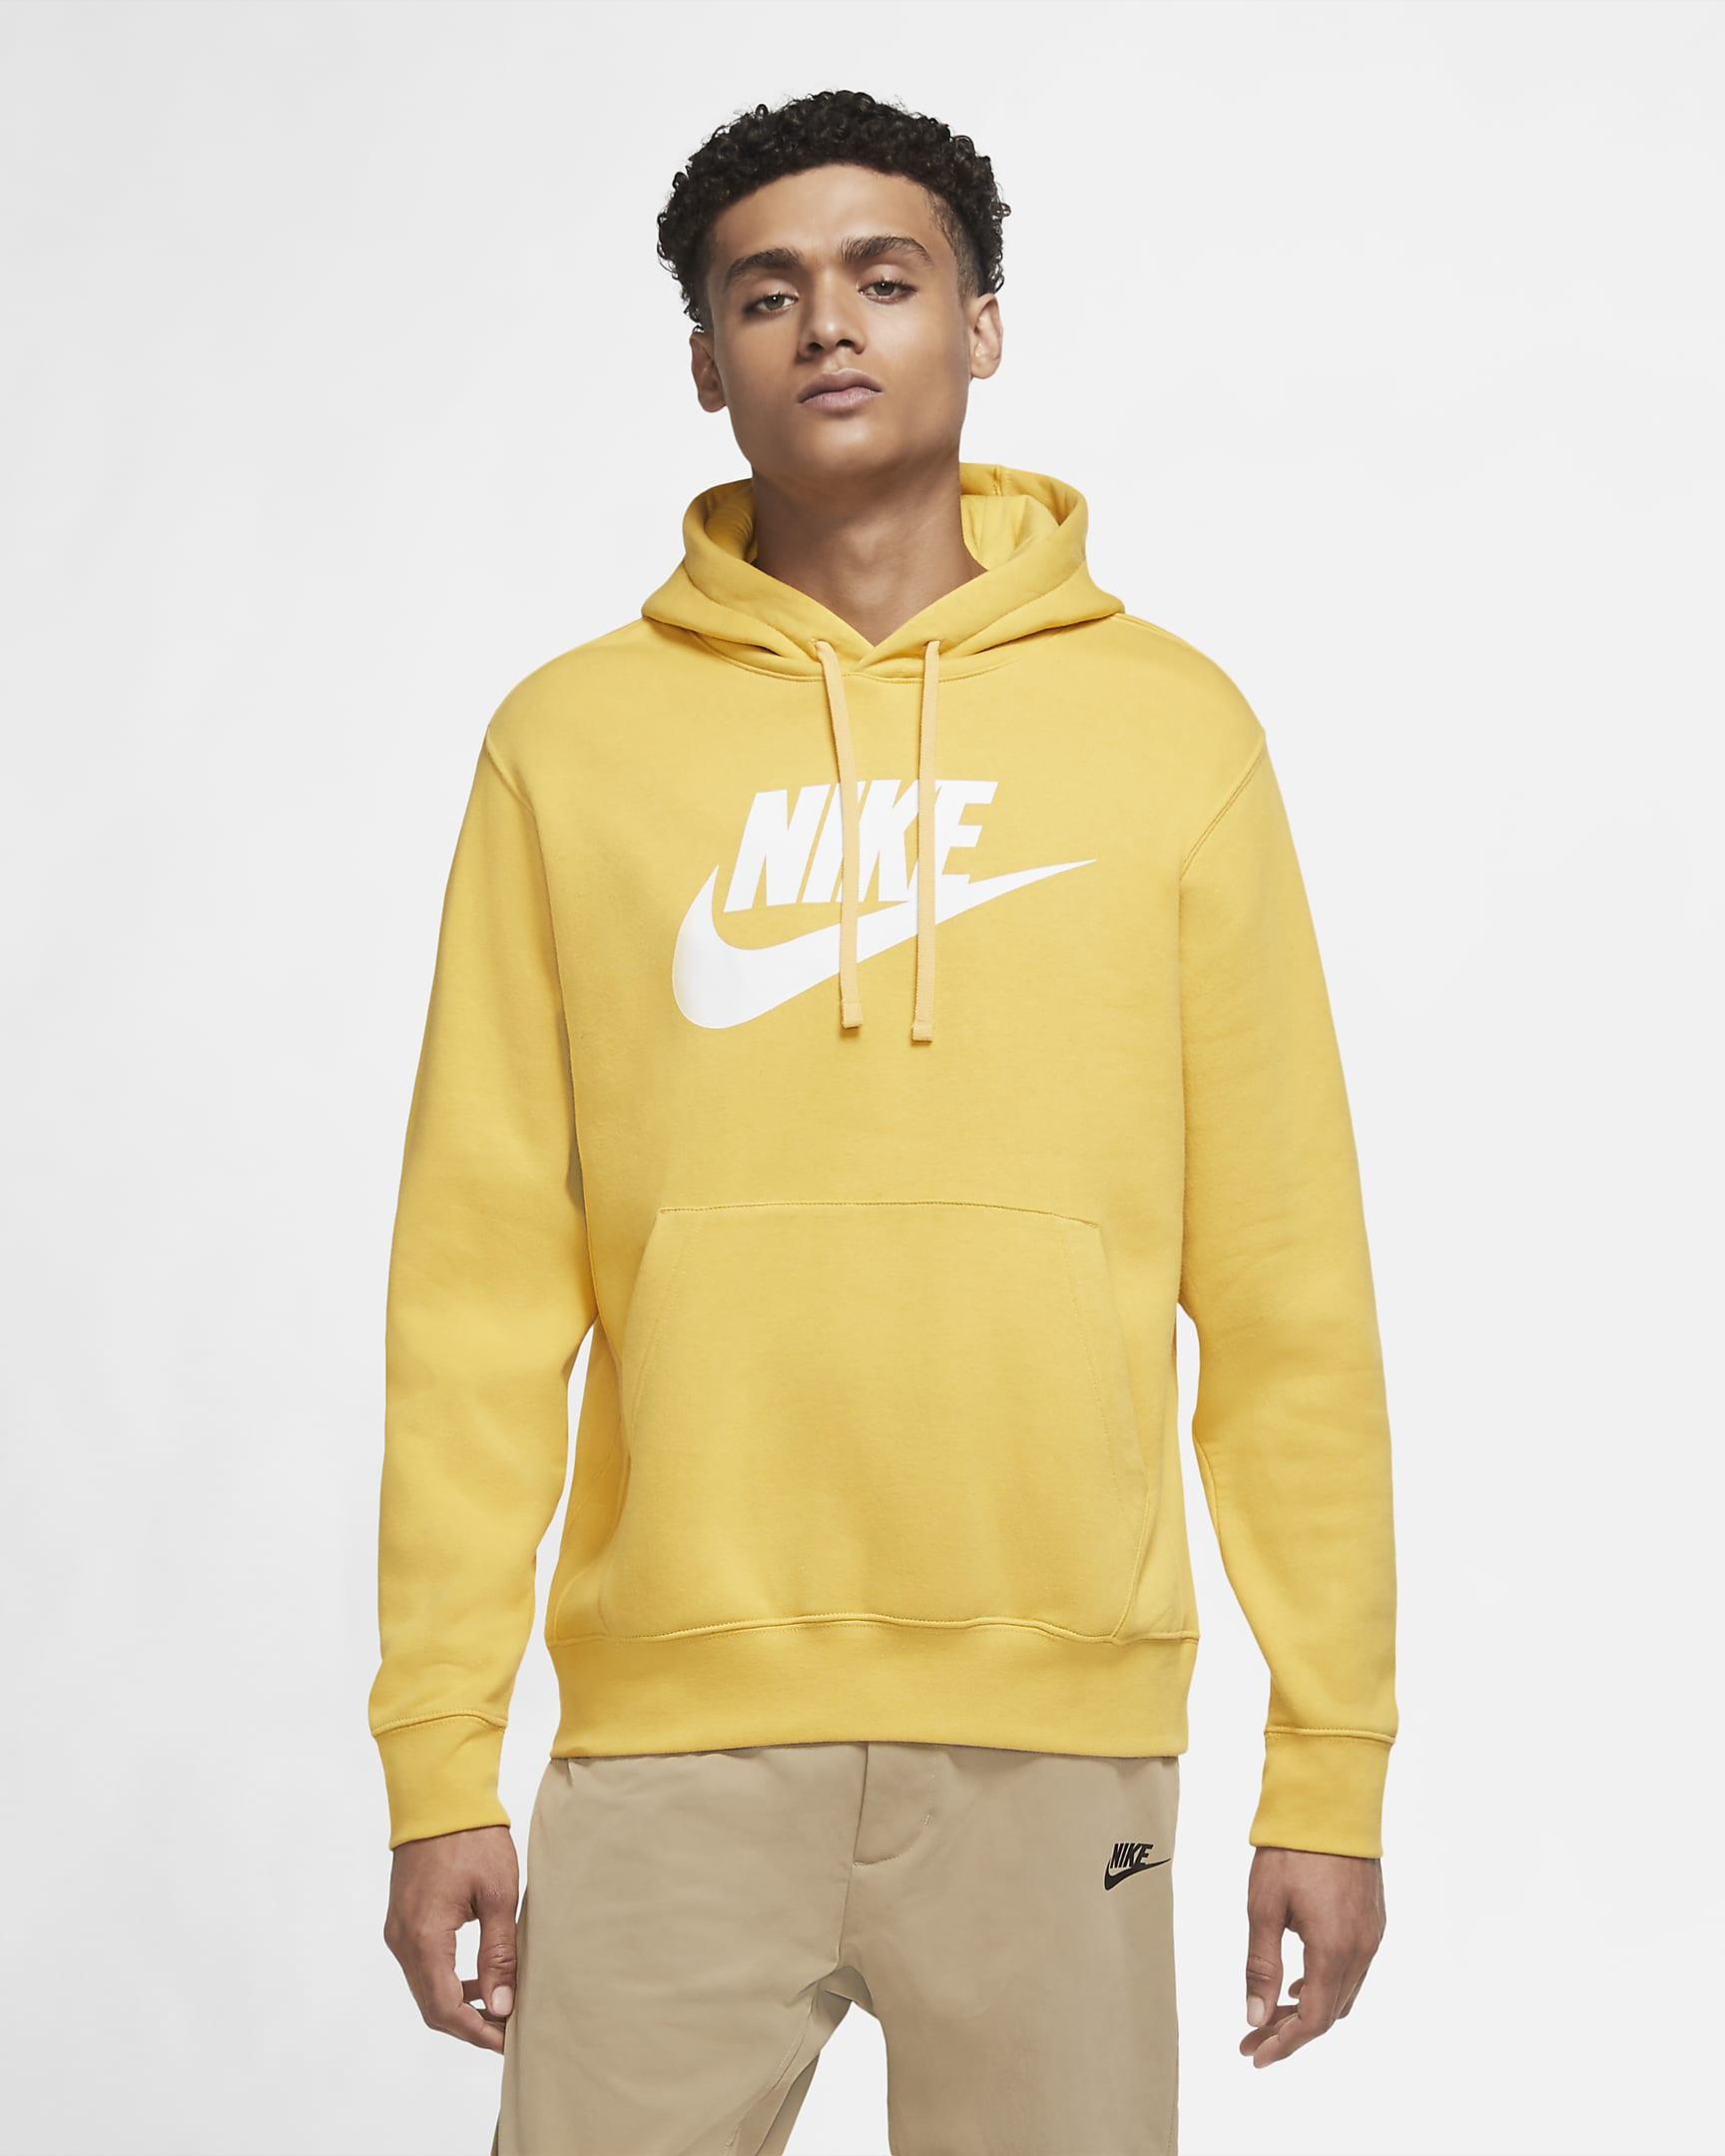 sportswear-club-fleece-mens-graphic-pullover-hoodie-R9w74B